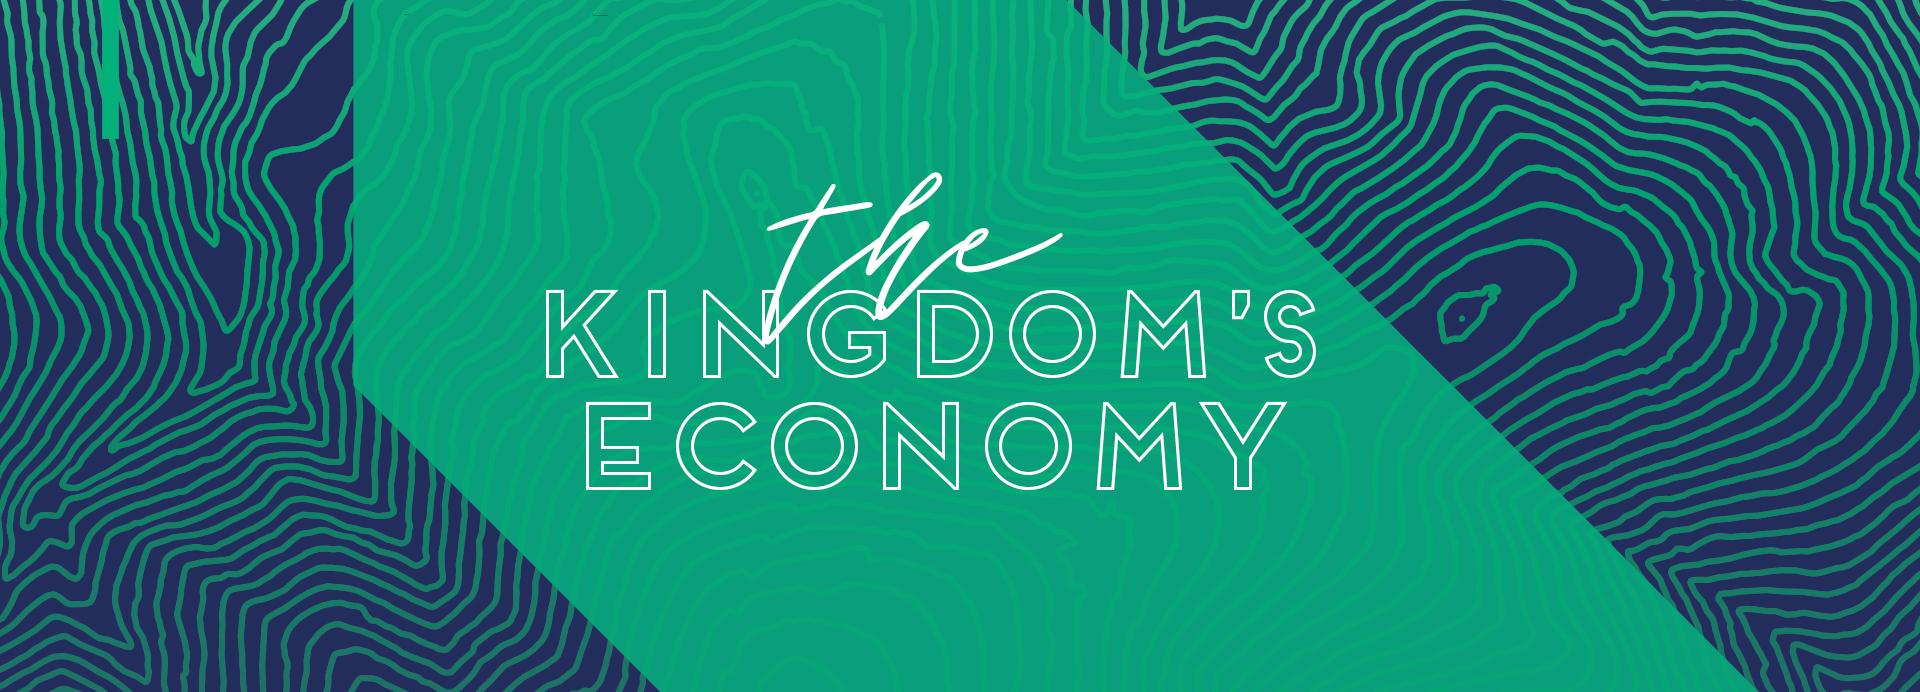 Kingdom's Economy banner.jpg